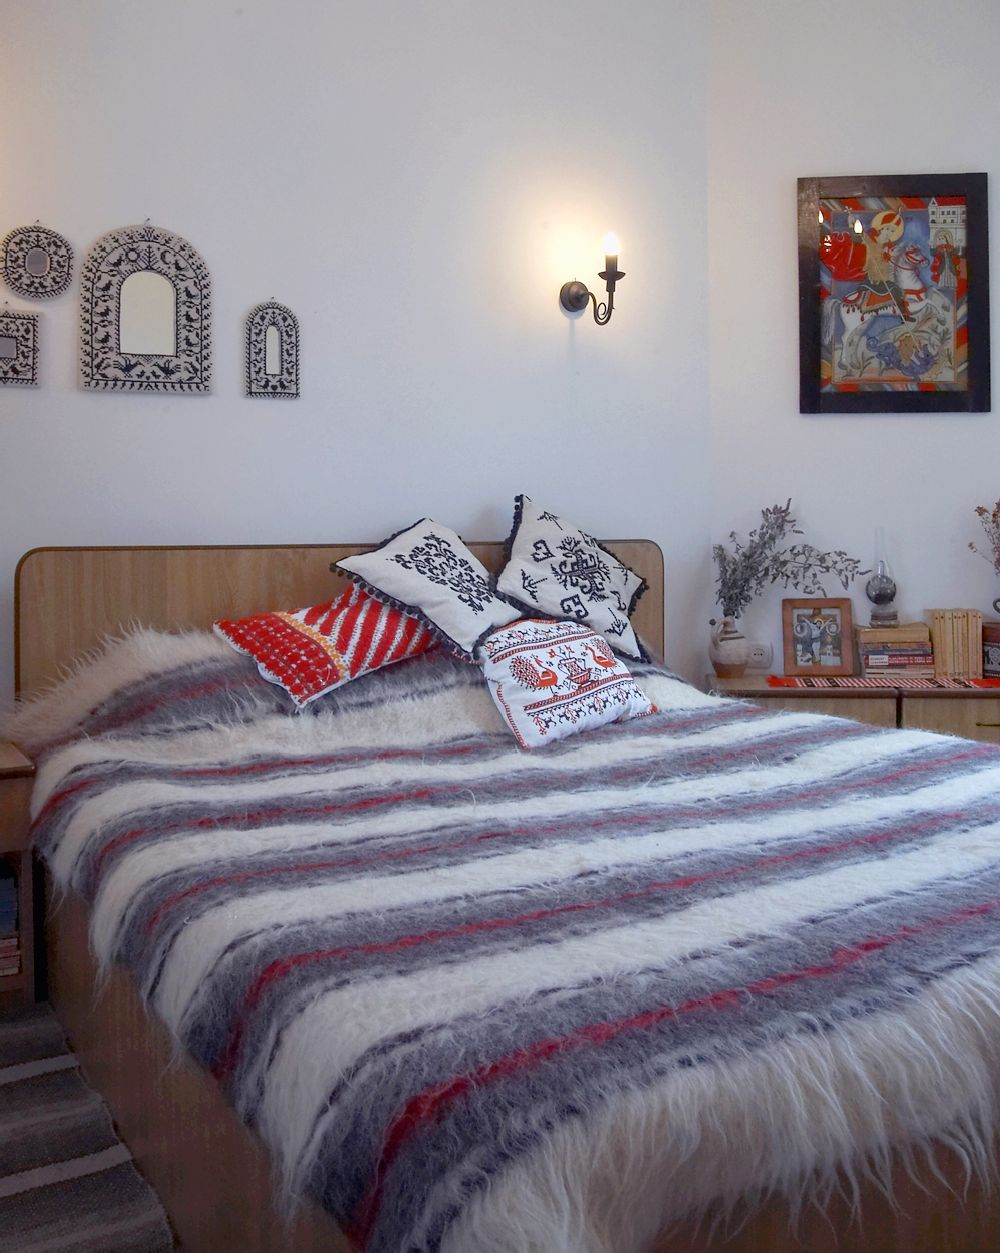 adelaparvu.com despre Anca Ciuciulin si casa ei cu decor traditional romanesc (2)